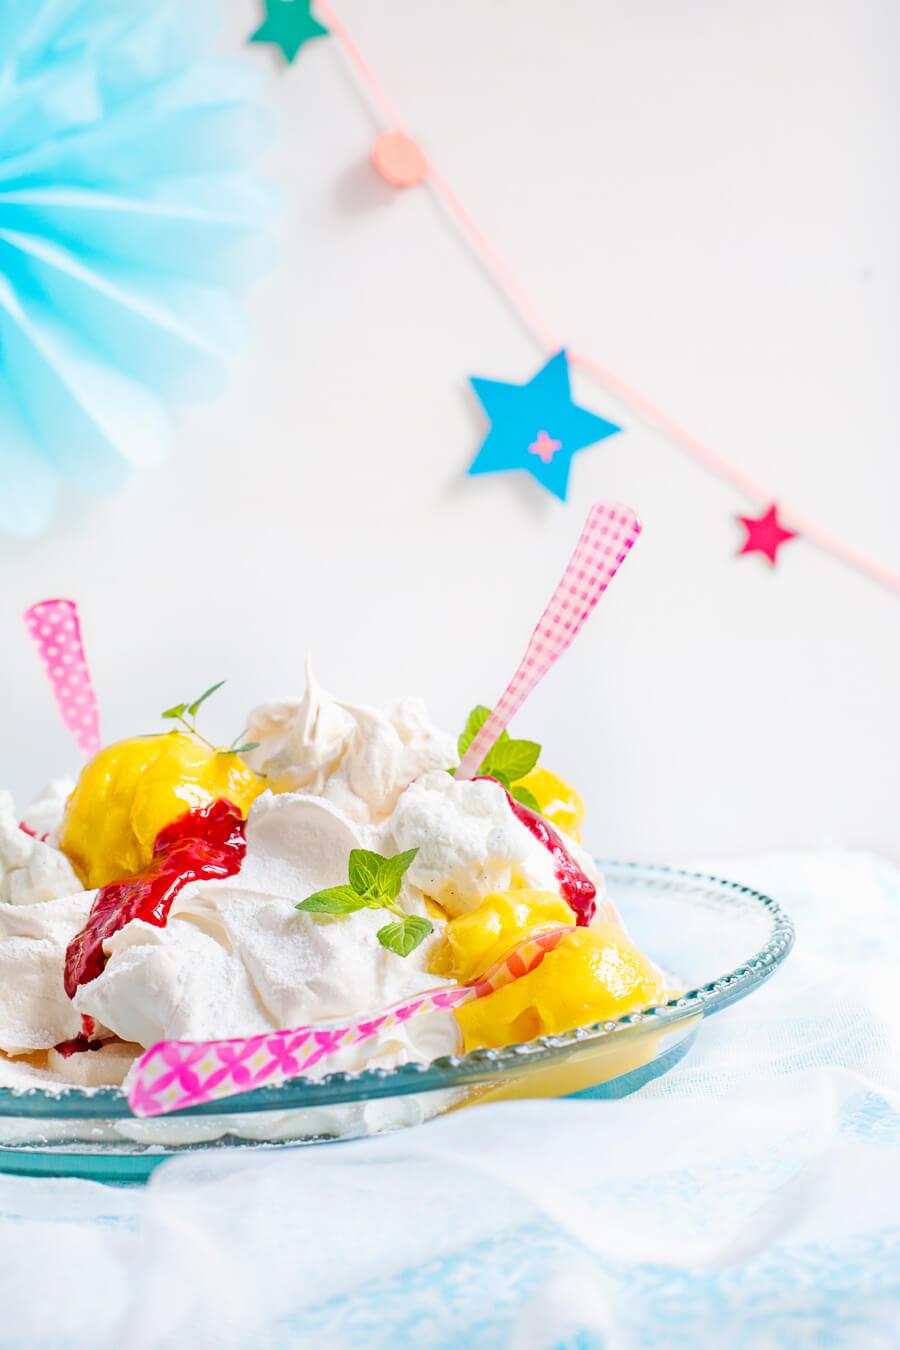 Pavlova-Mangosorbet with cream